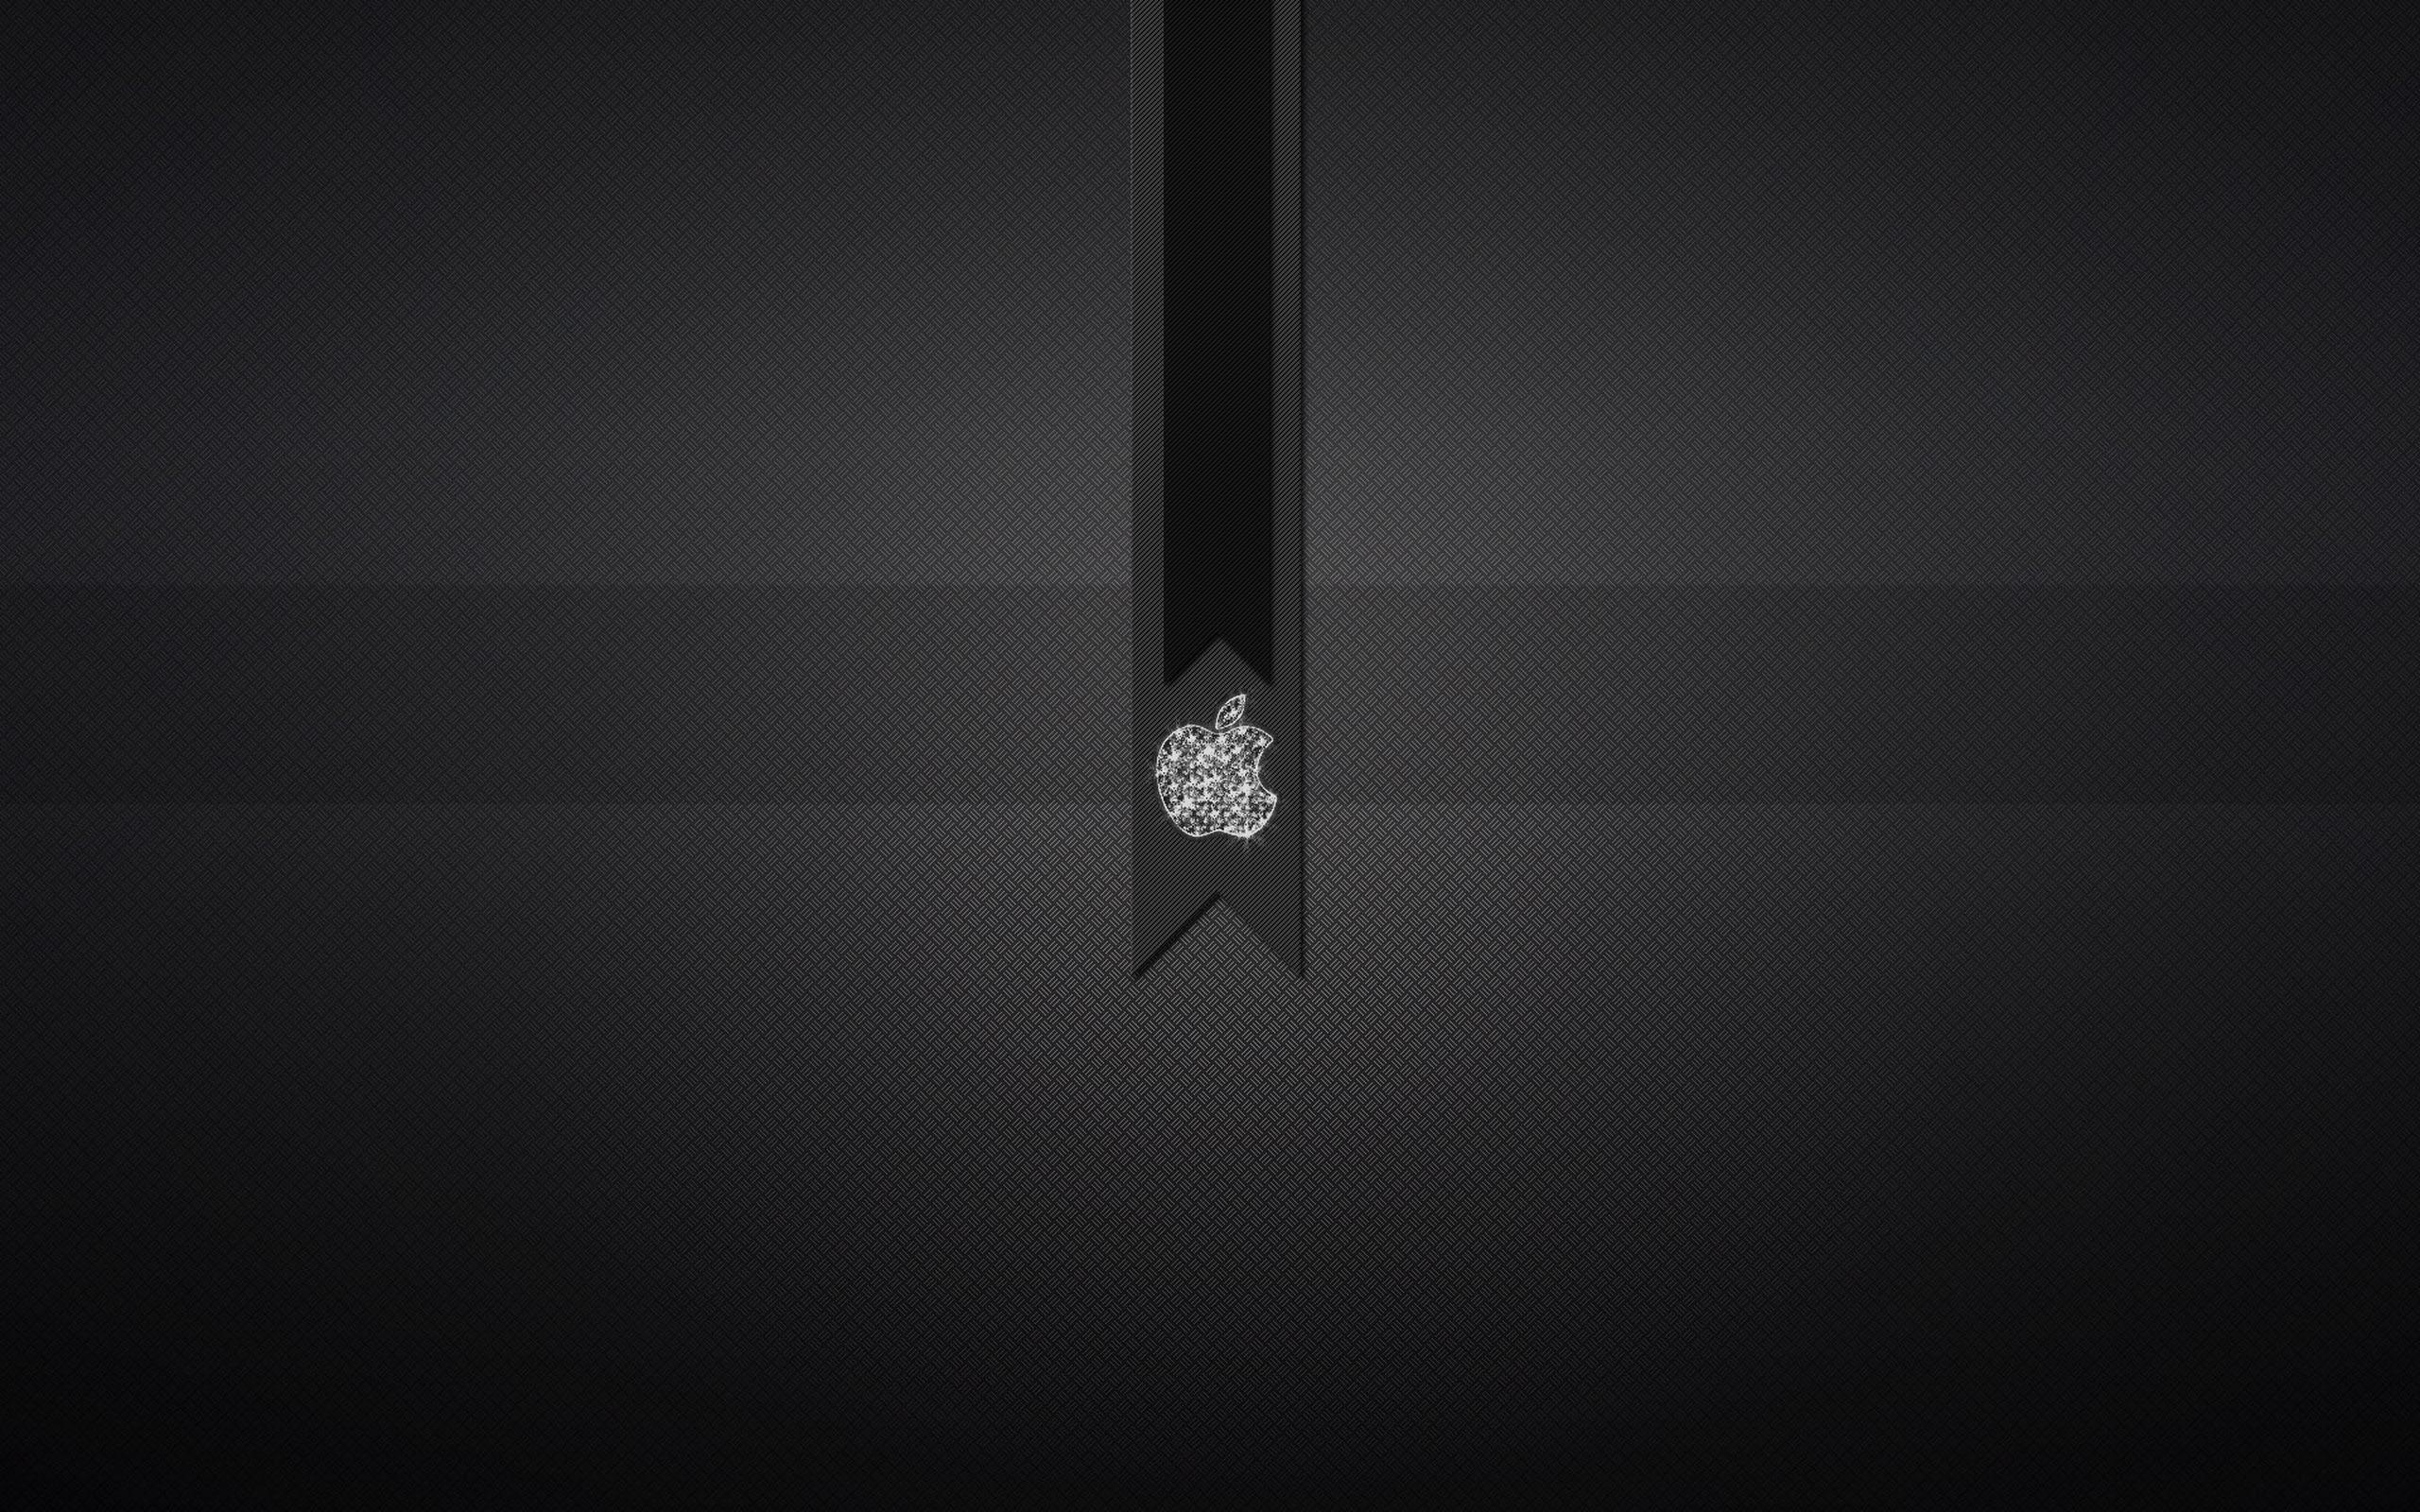 black mac background - sf wallpaper